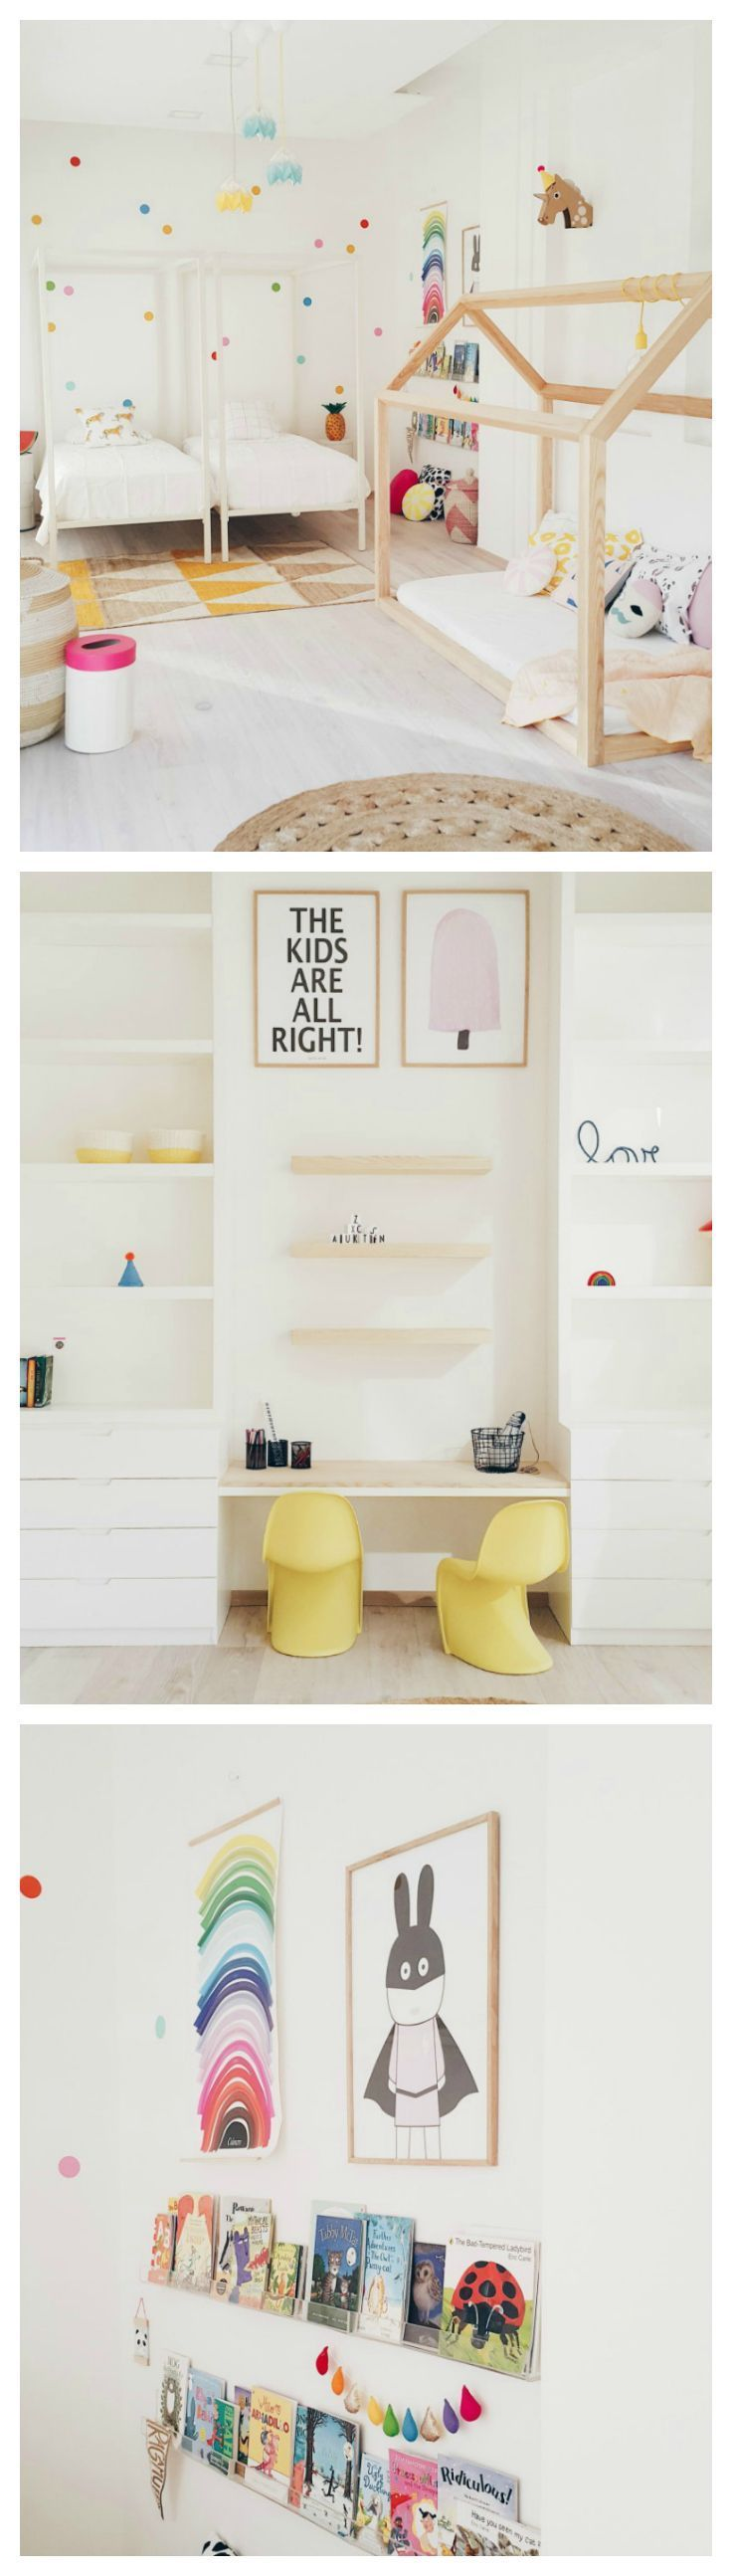 Chambre enfant gaie et colorée en tons pastels | Colourful shared room #KidBedrooms